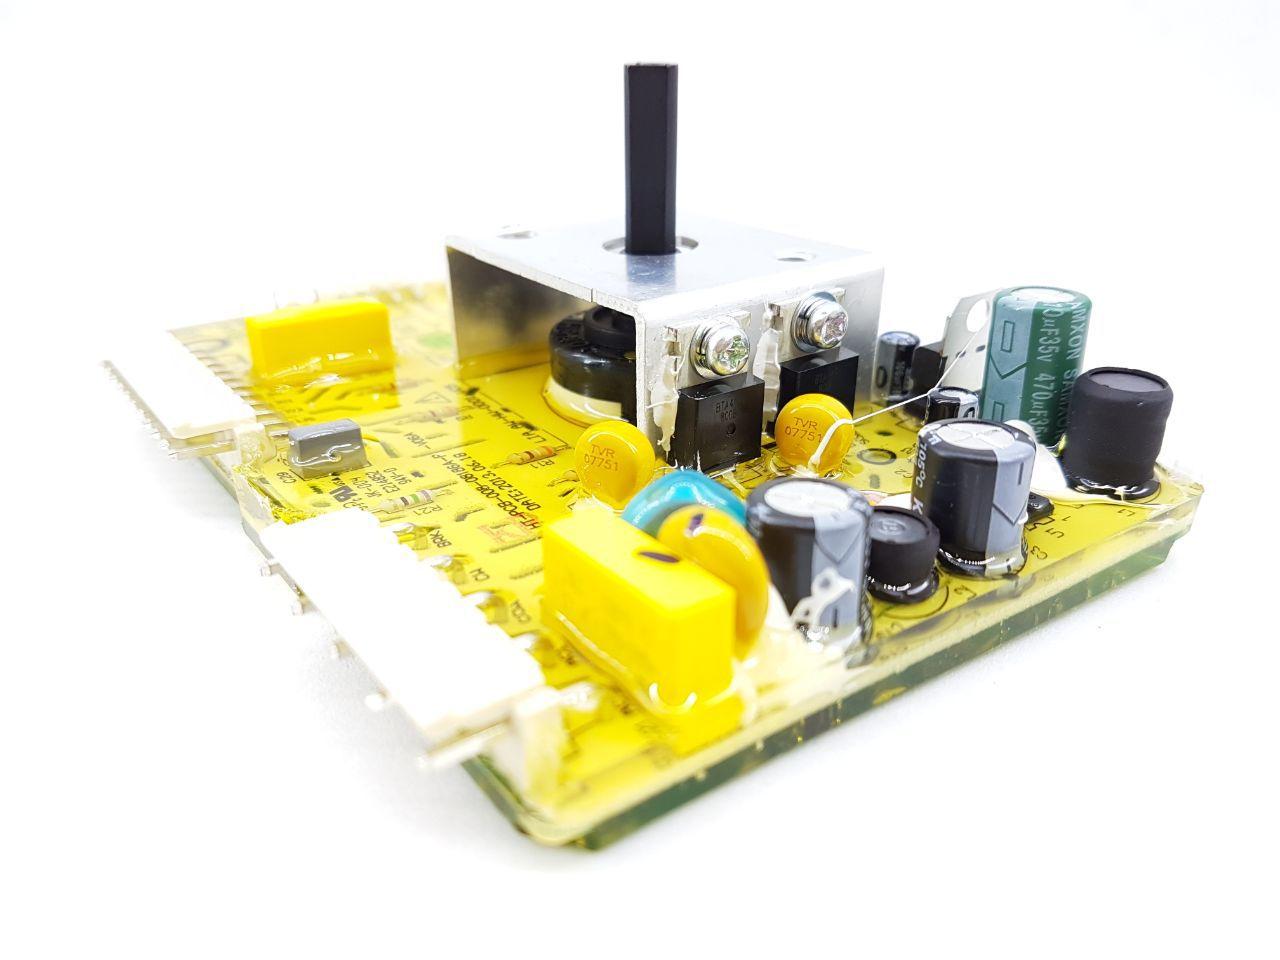 Placa Eletrônica Electrolux Ltc15aw 70200649 Original Bivolt